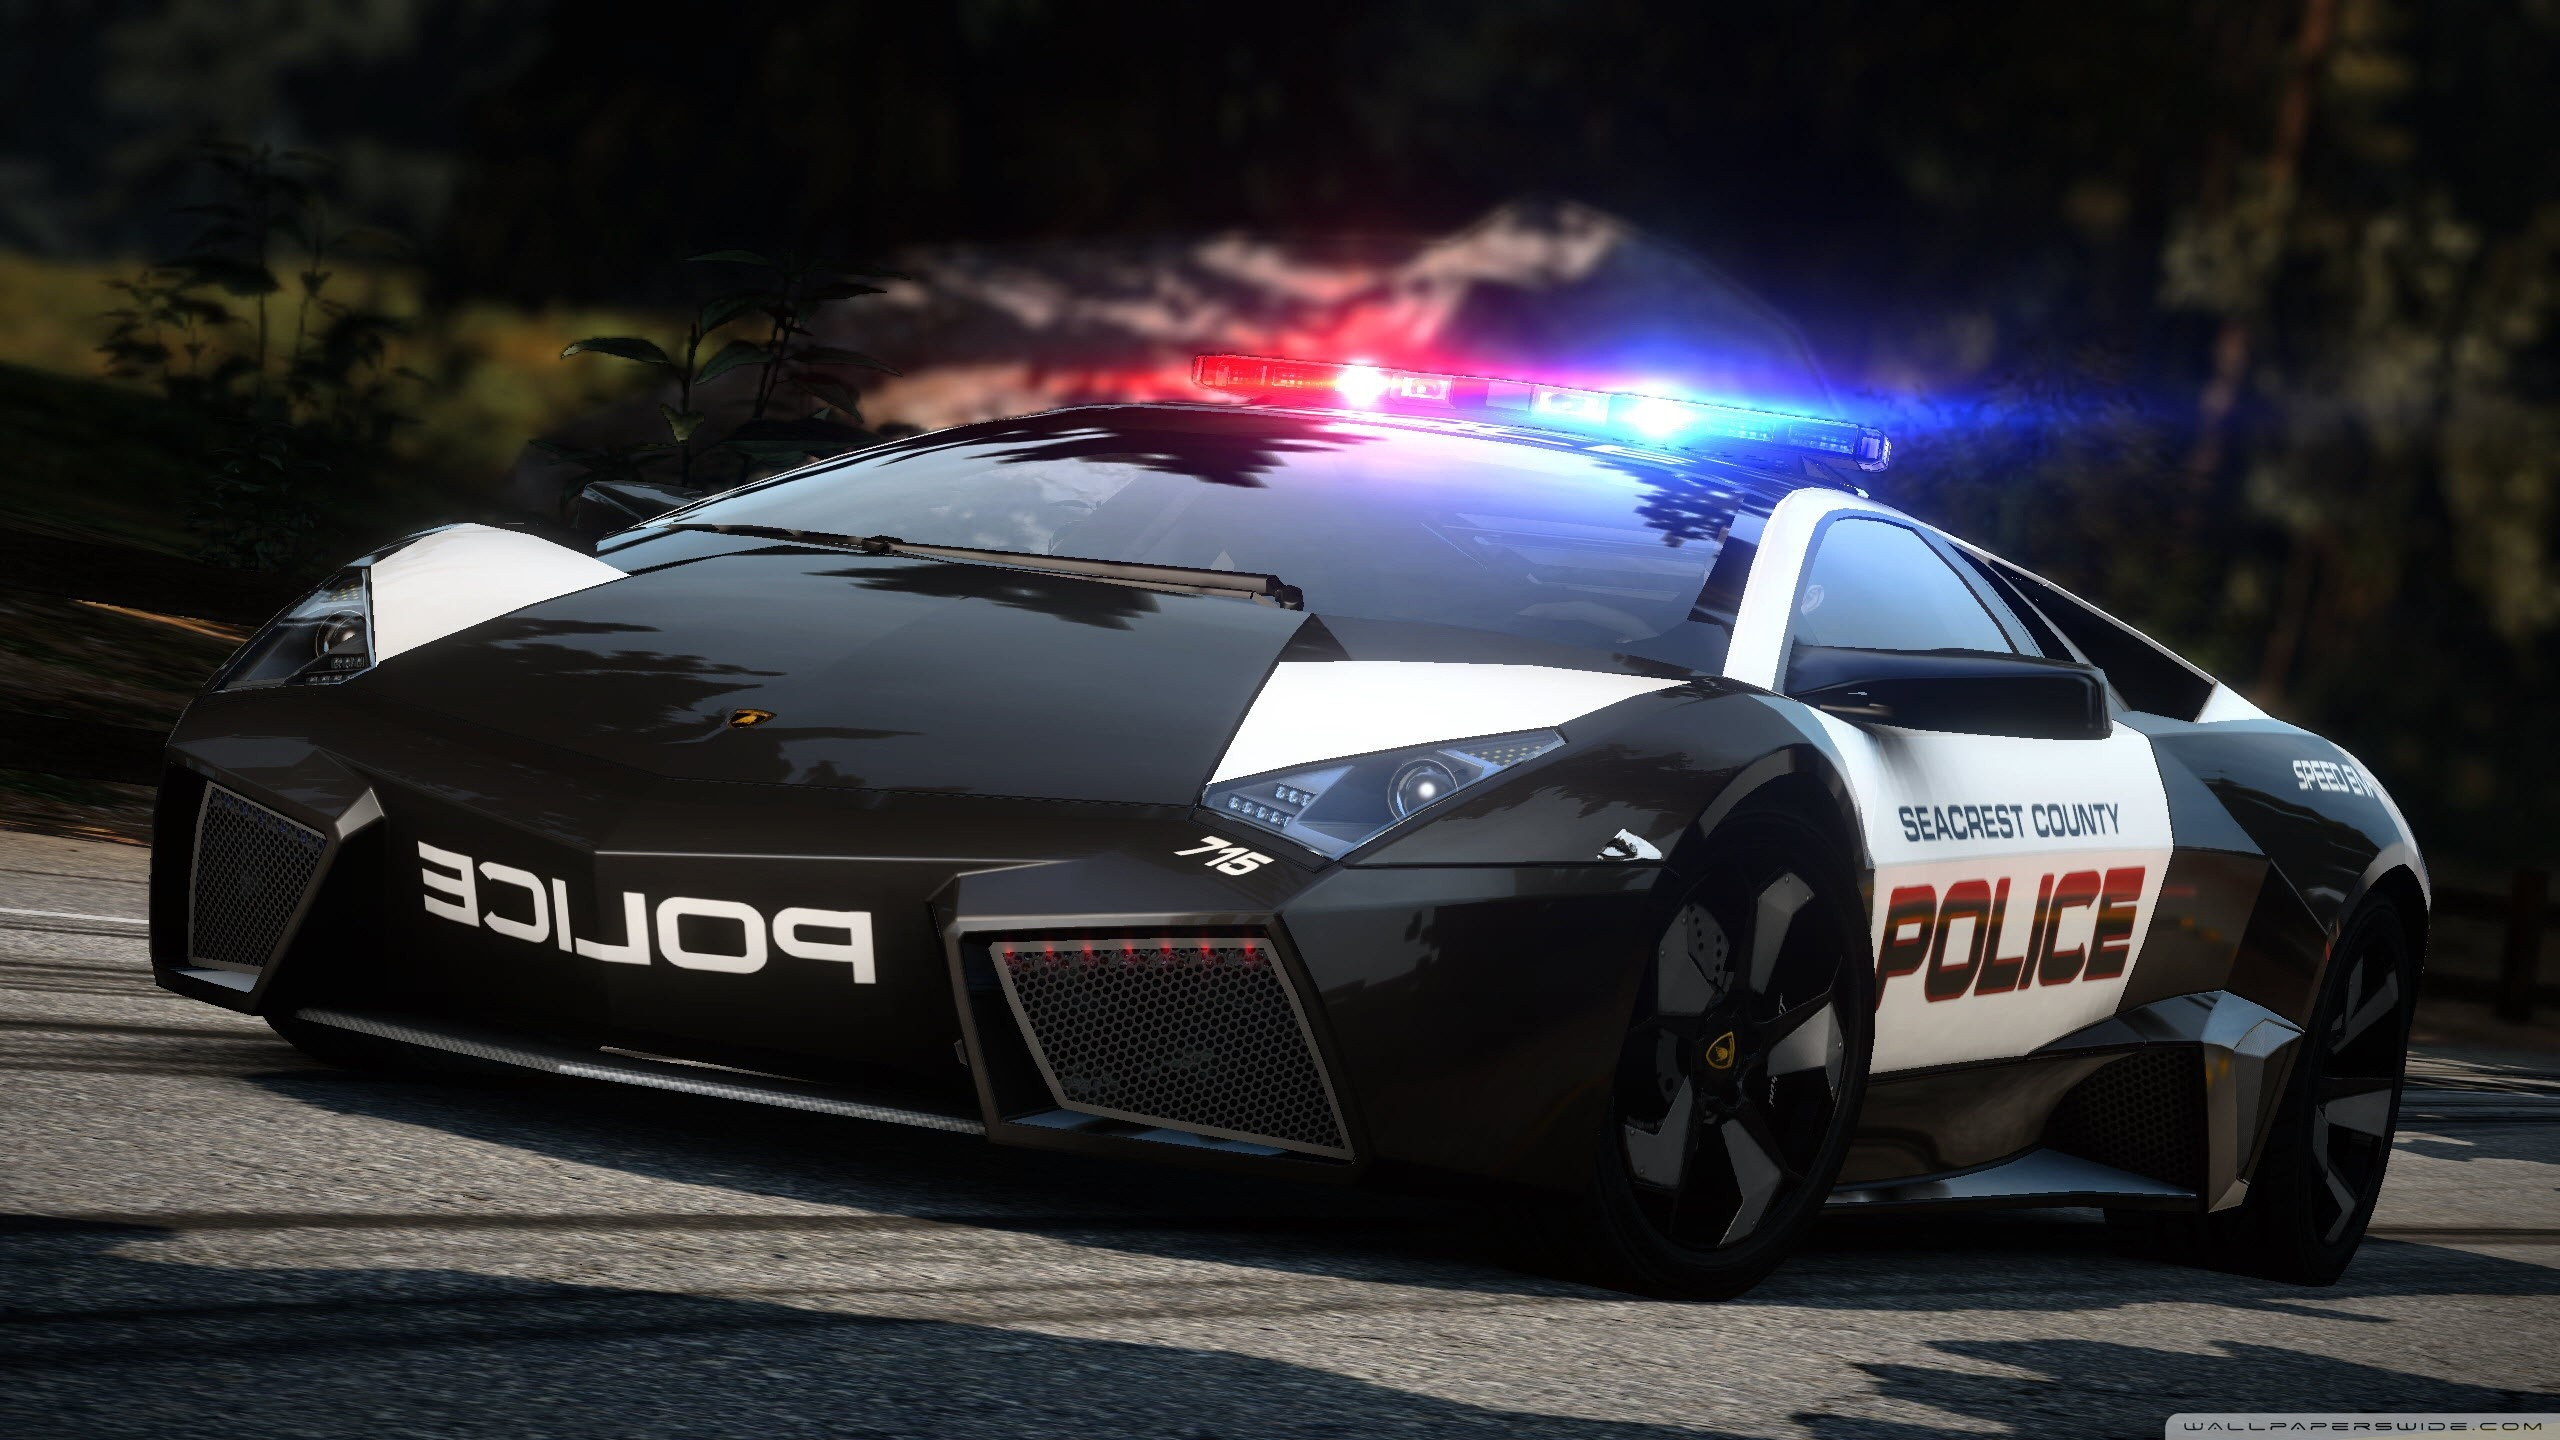 Need For Speed Hot Pursuit Lamborghini Police Car Wallpaper